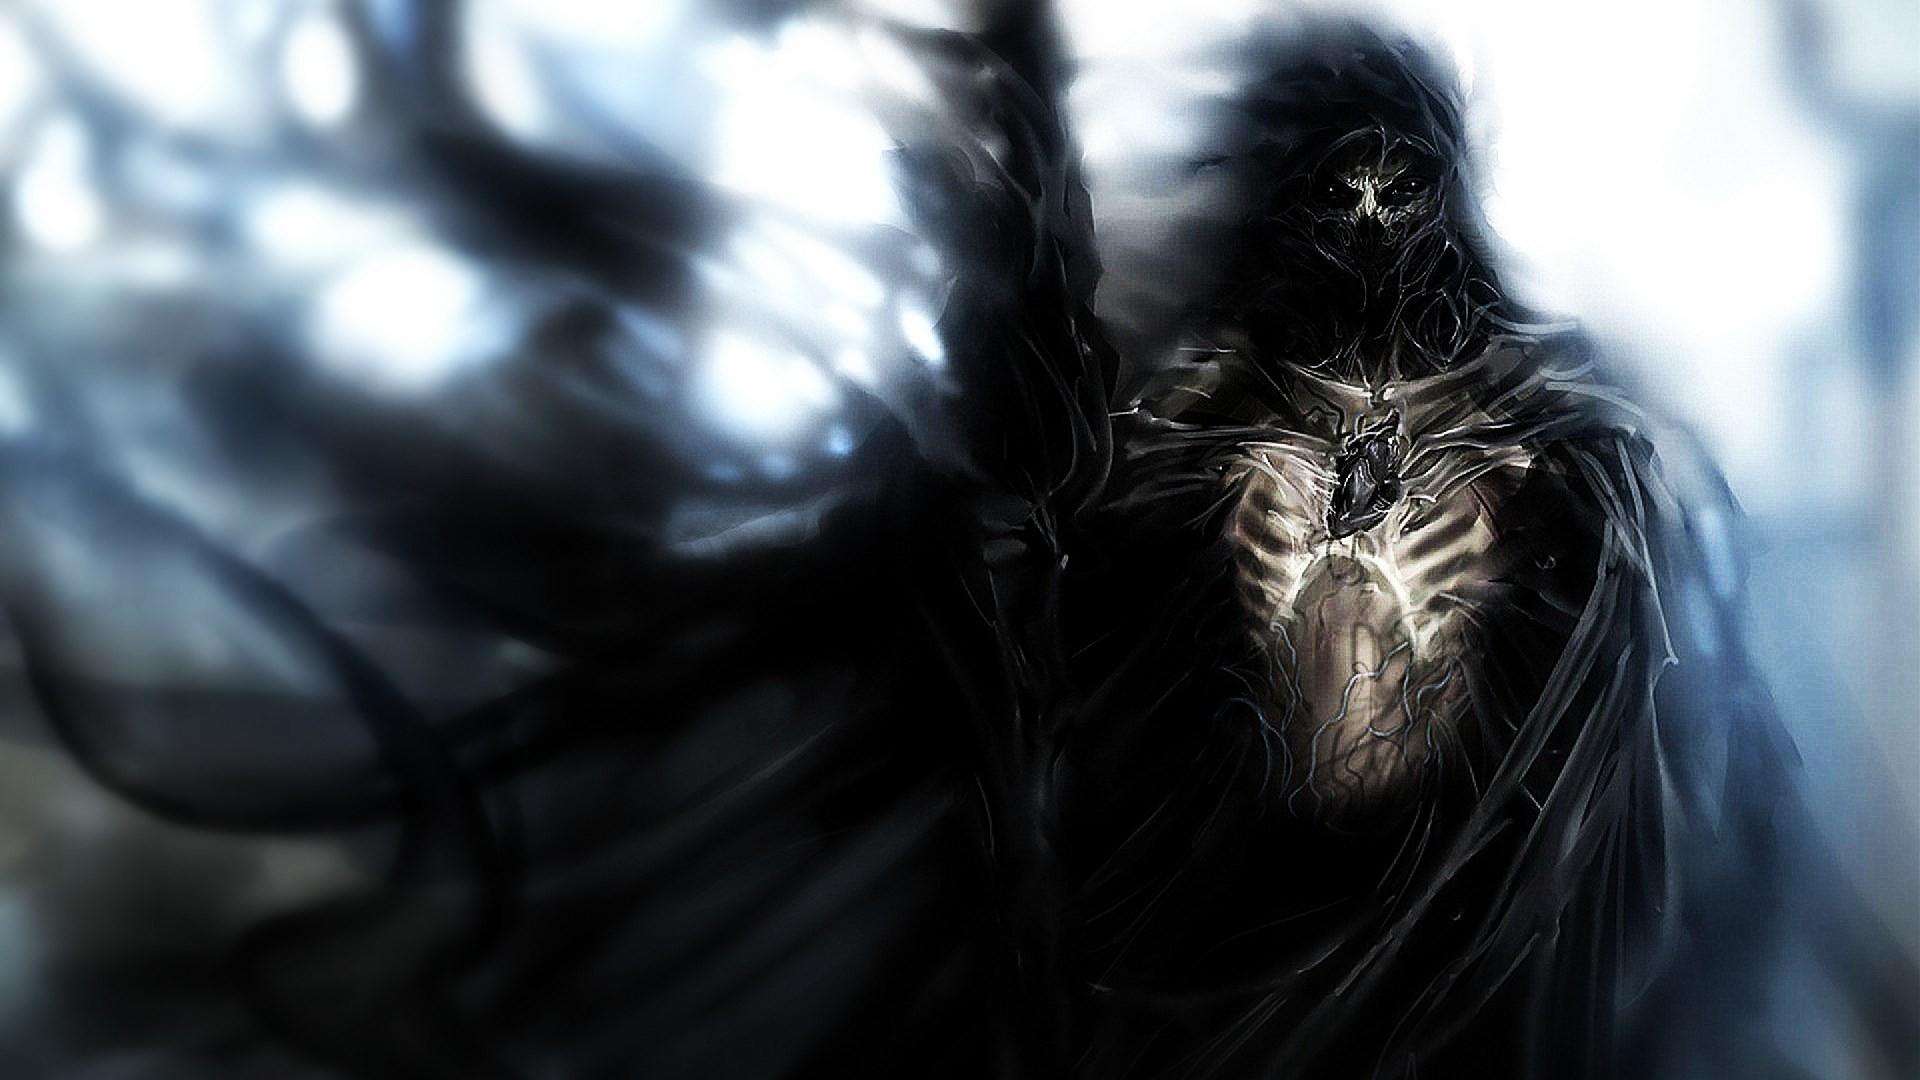 dark evil backround: Full HD Pictures by Hamblin Longman